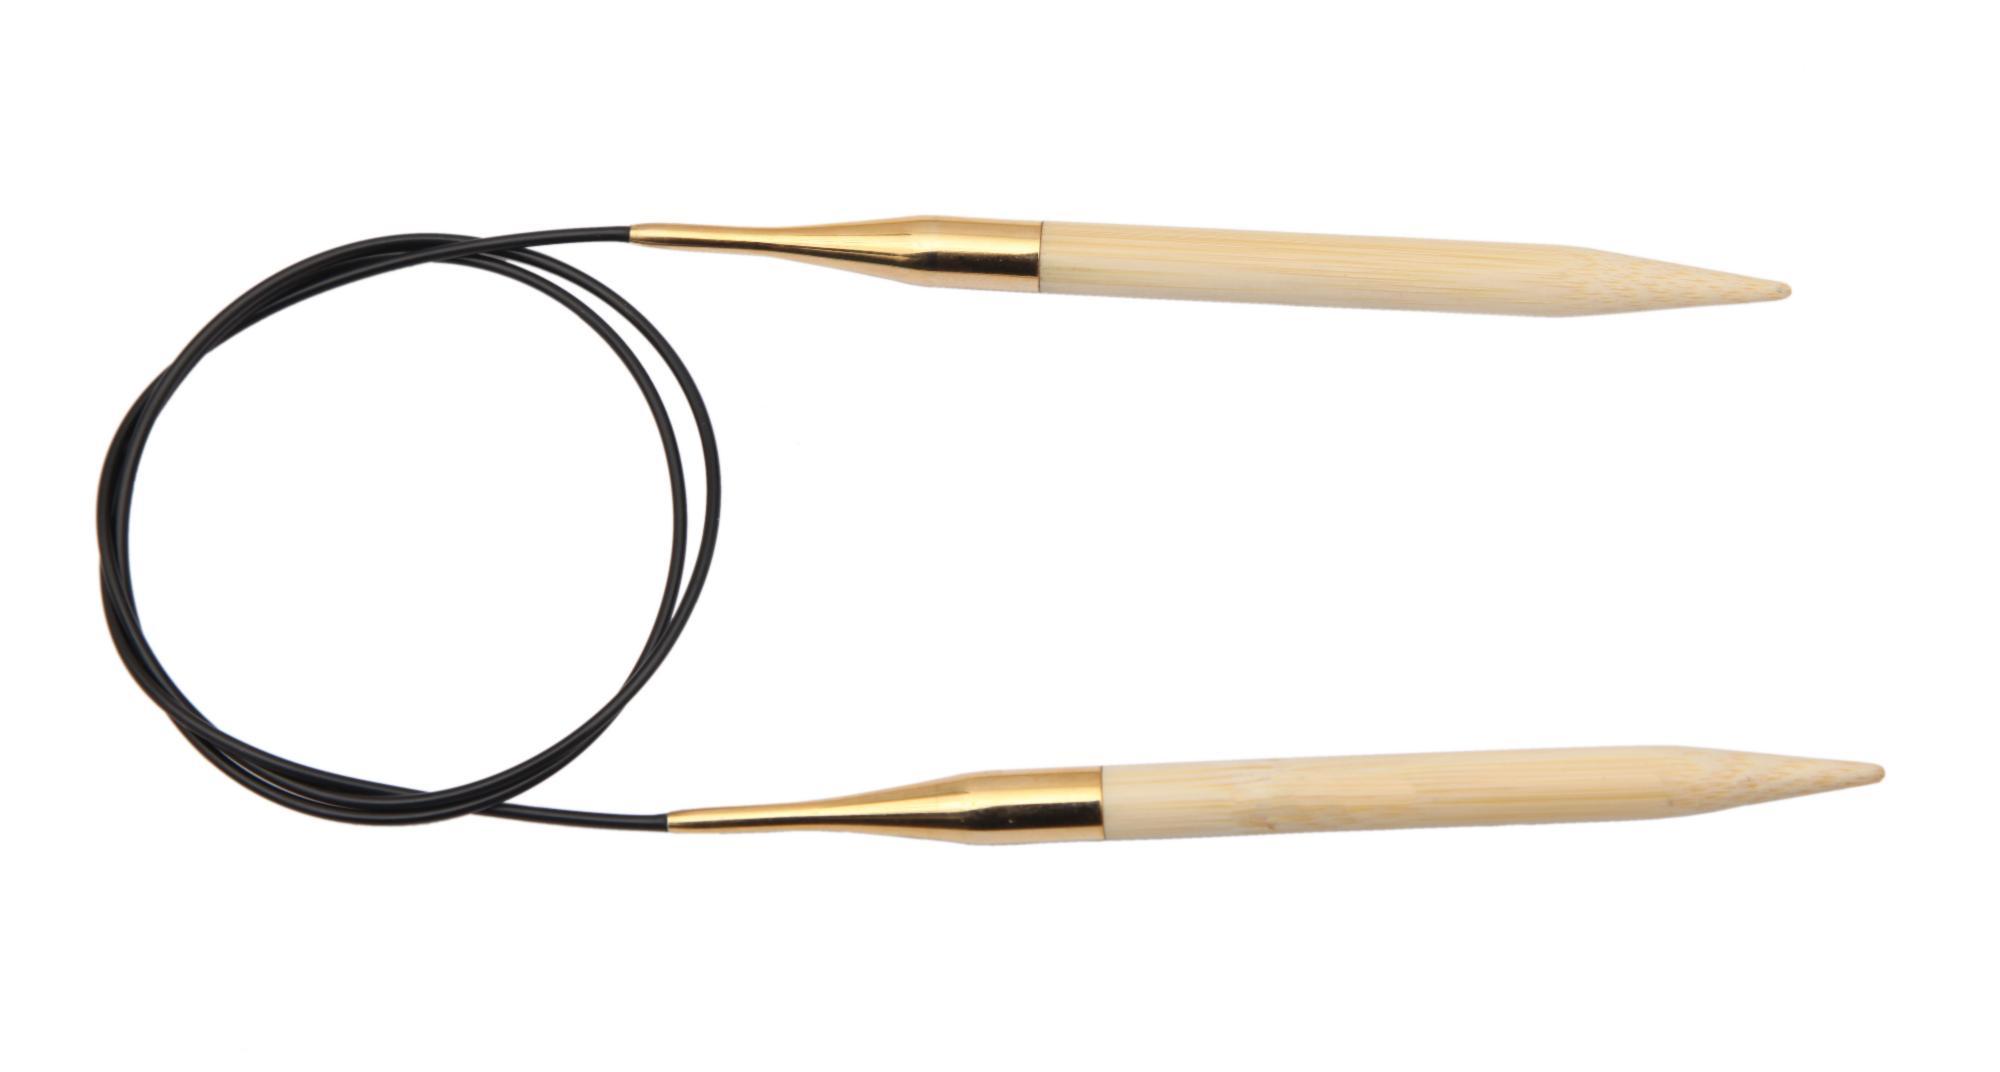 Спицы круговые 80 см Bamboo KnitPro, 22248, 4.50 мм